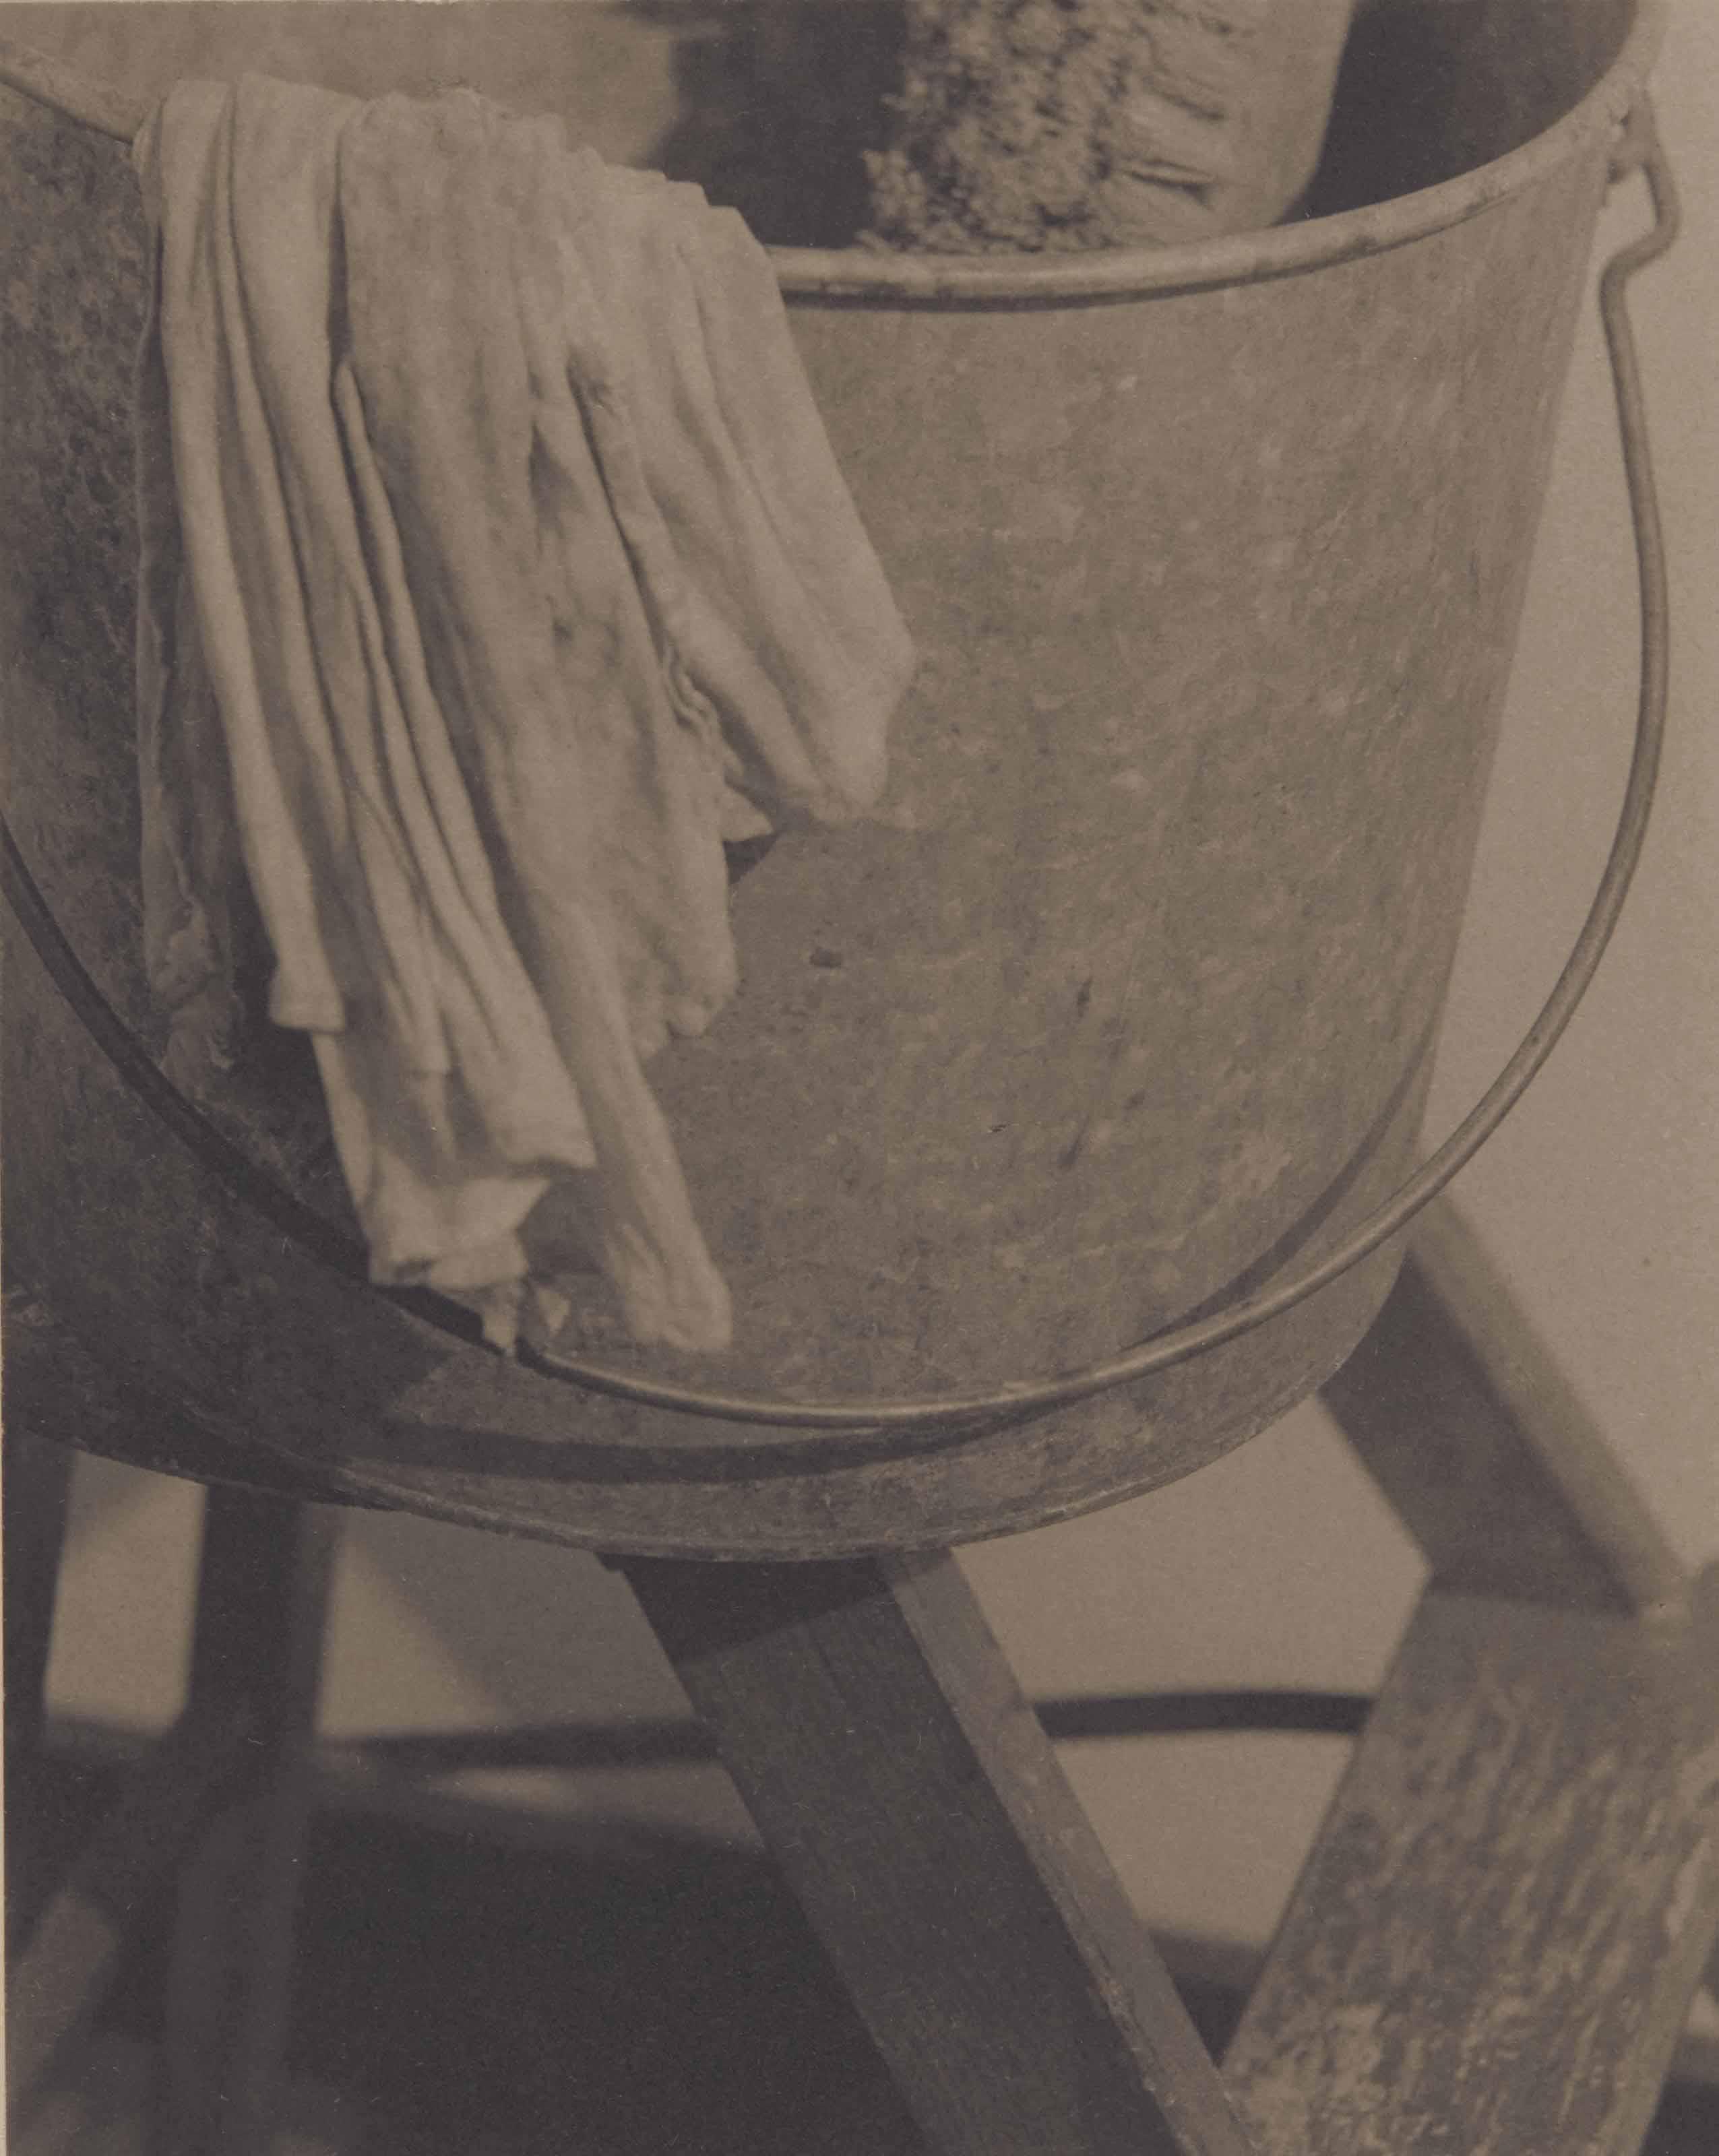 Pail on ladder, 1922